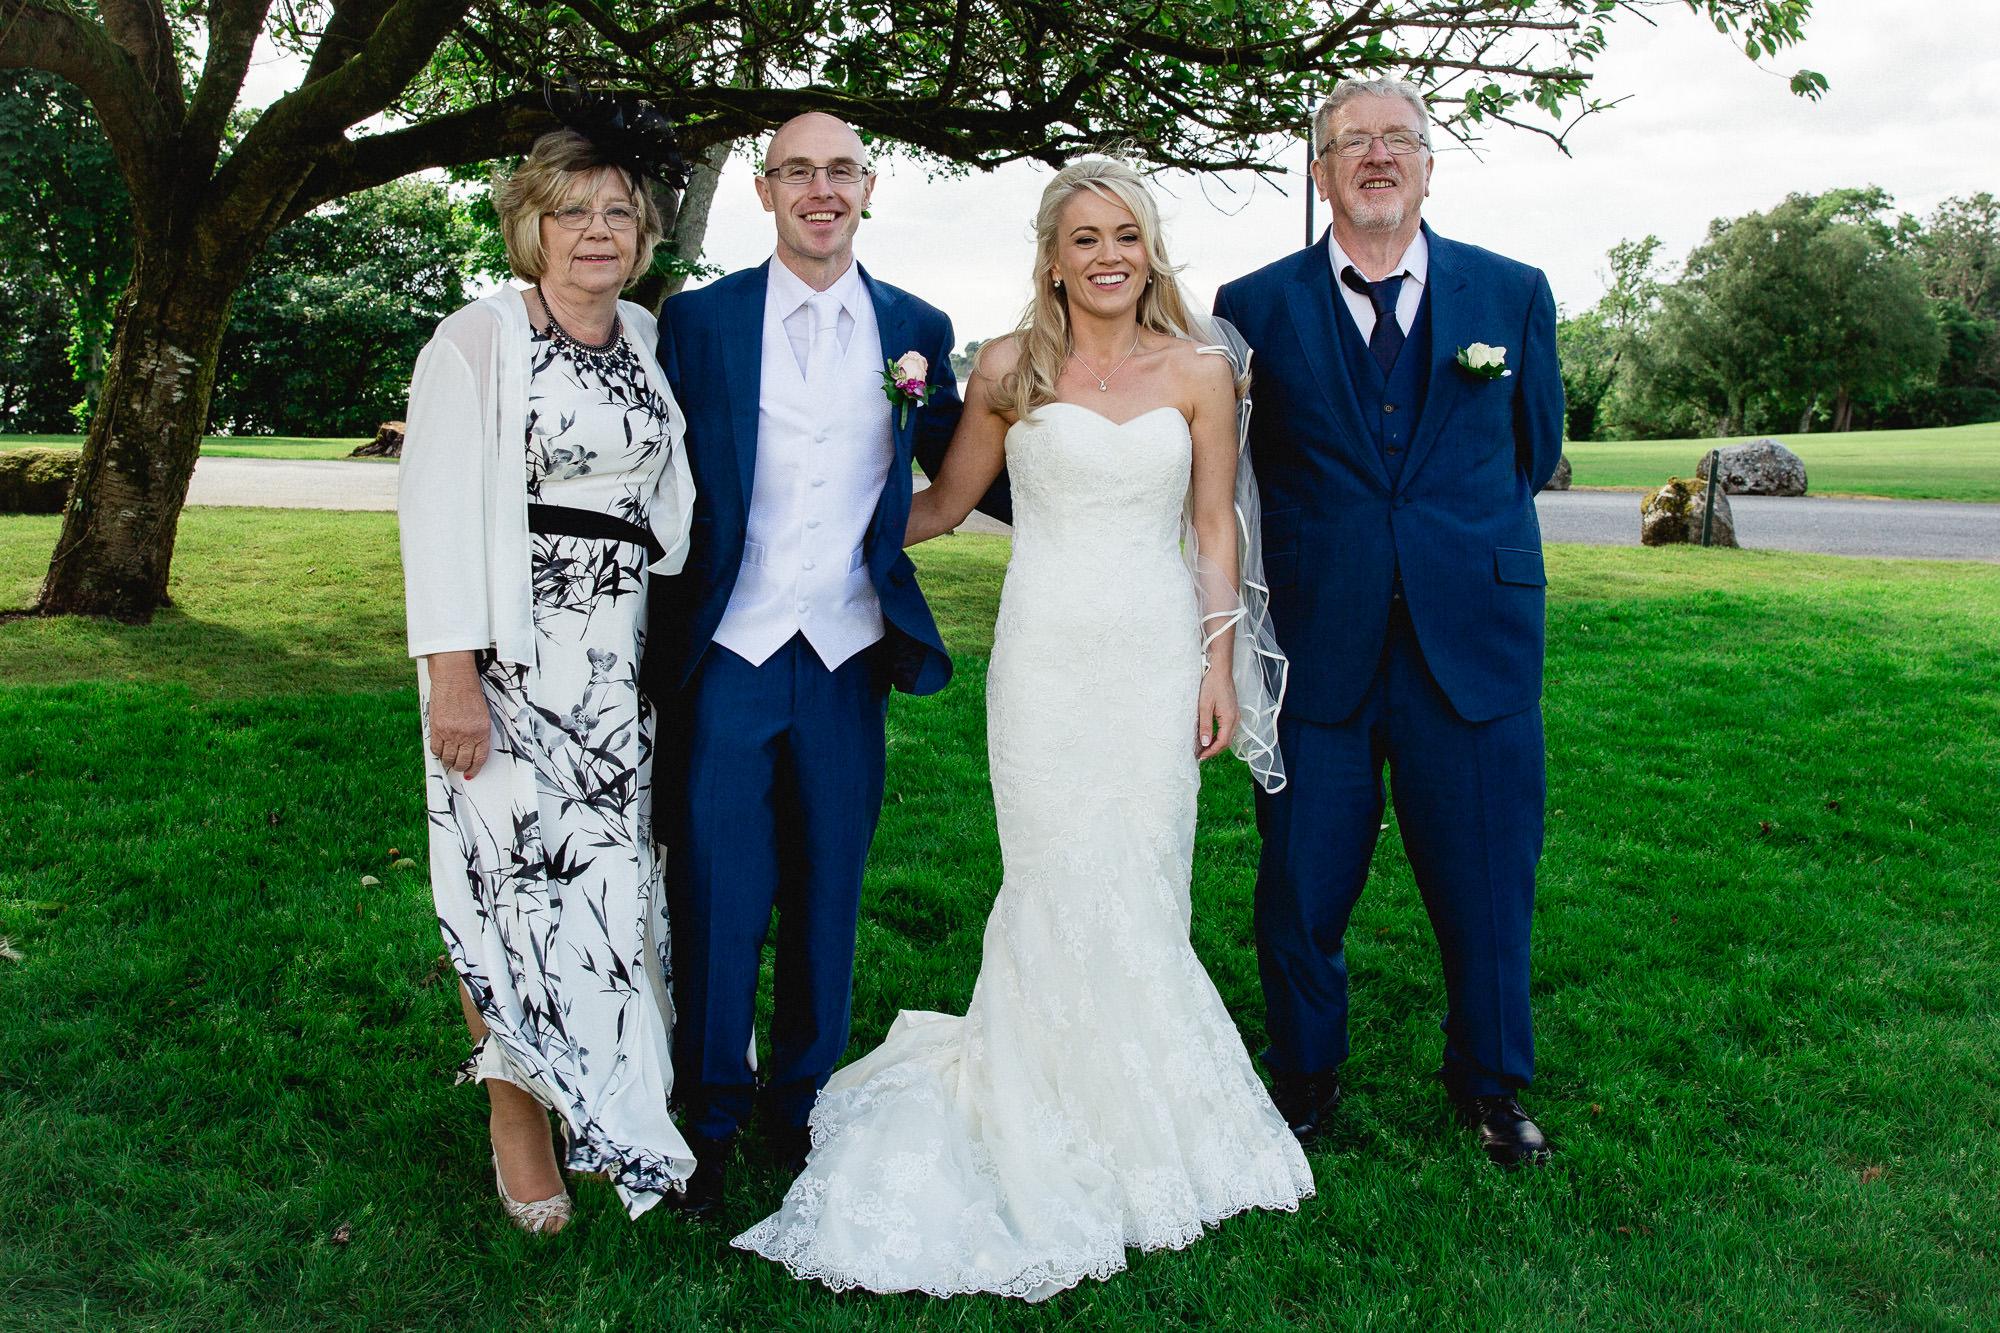 CLAIREBYRNEPHOTOGRAPHY-WEDDING-Ireland-tulffaris-alternative-fun-Lisa-terry-30.jpg